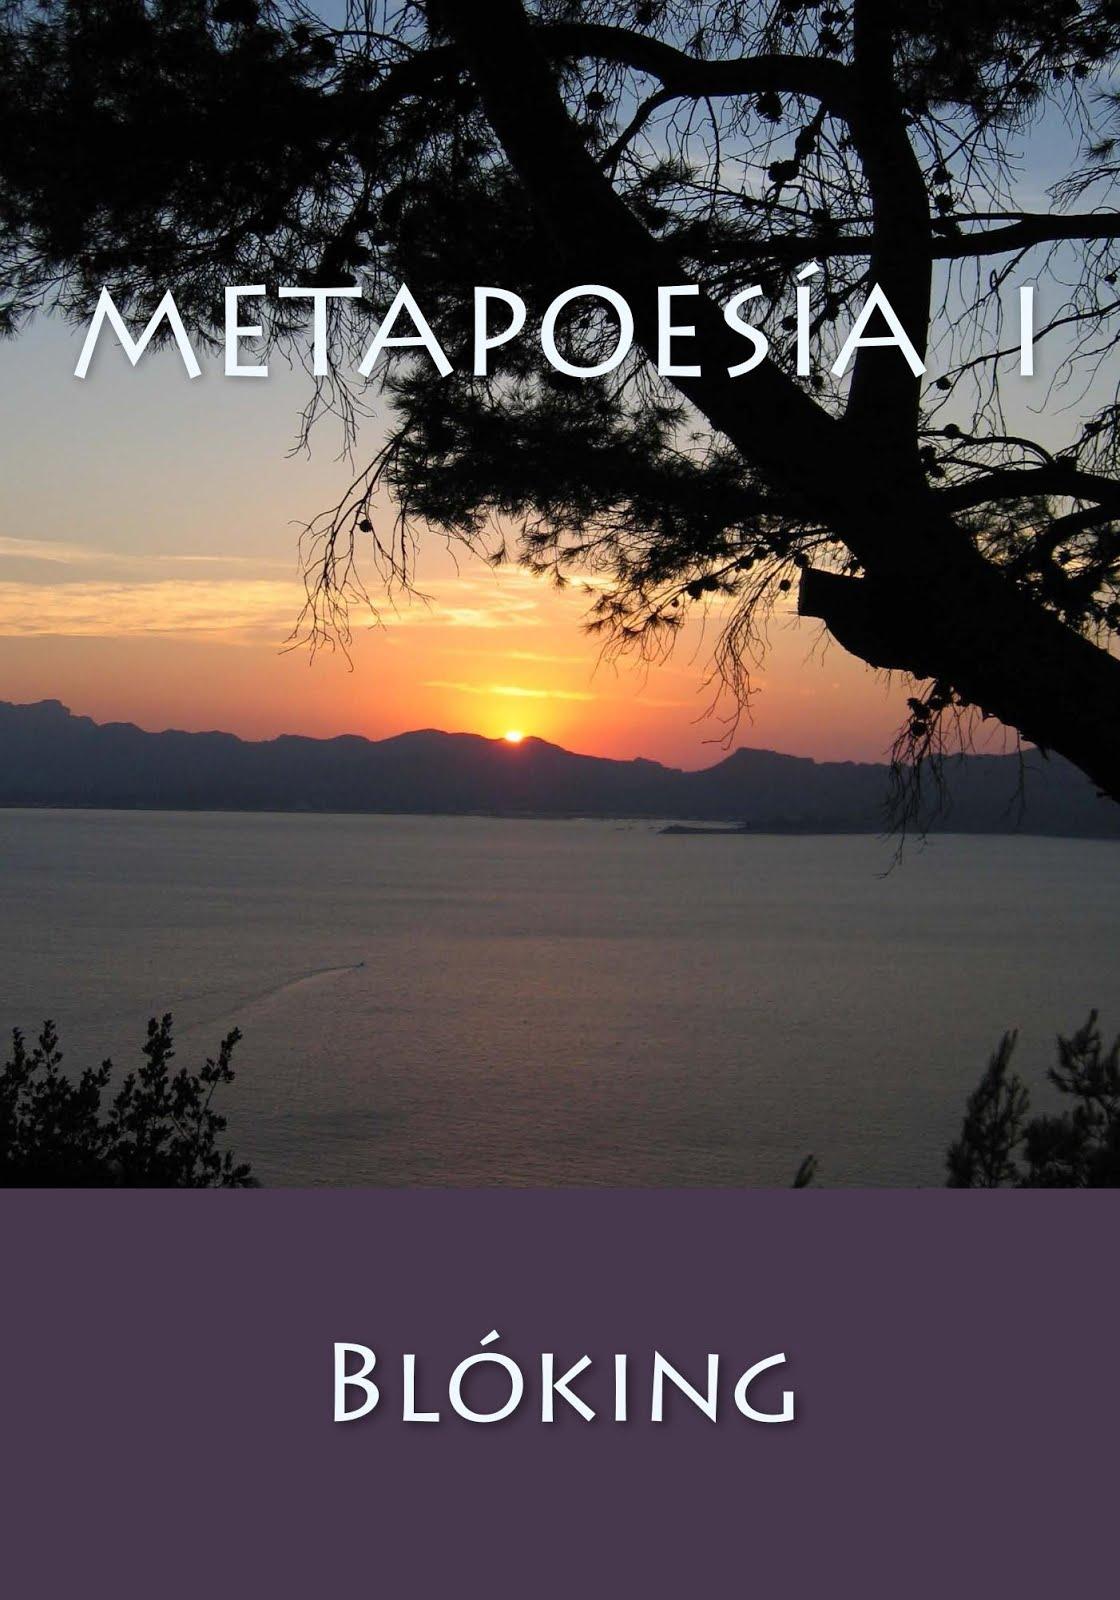 #Obra 29 - Metapoesía I